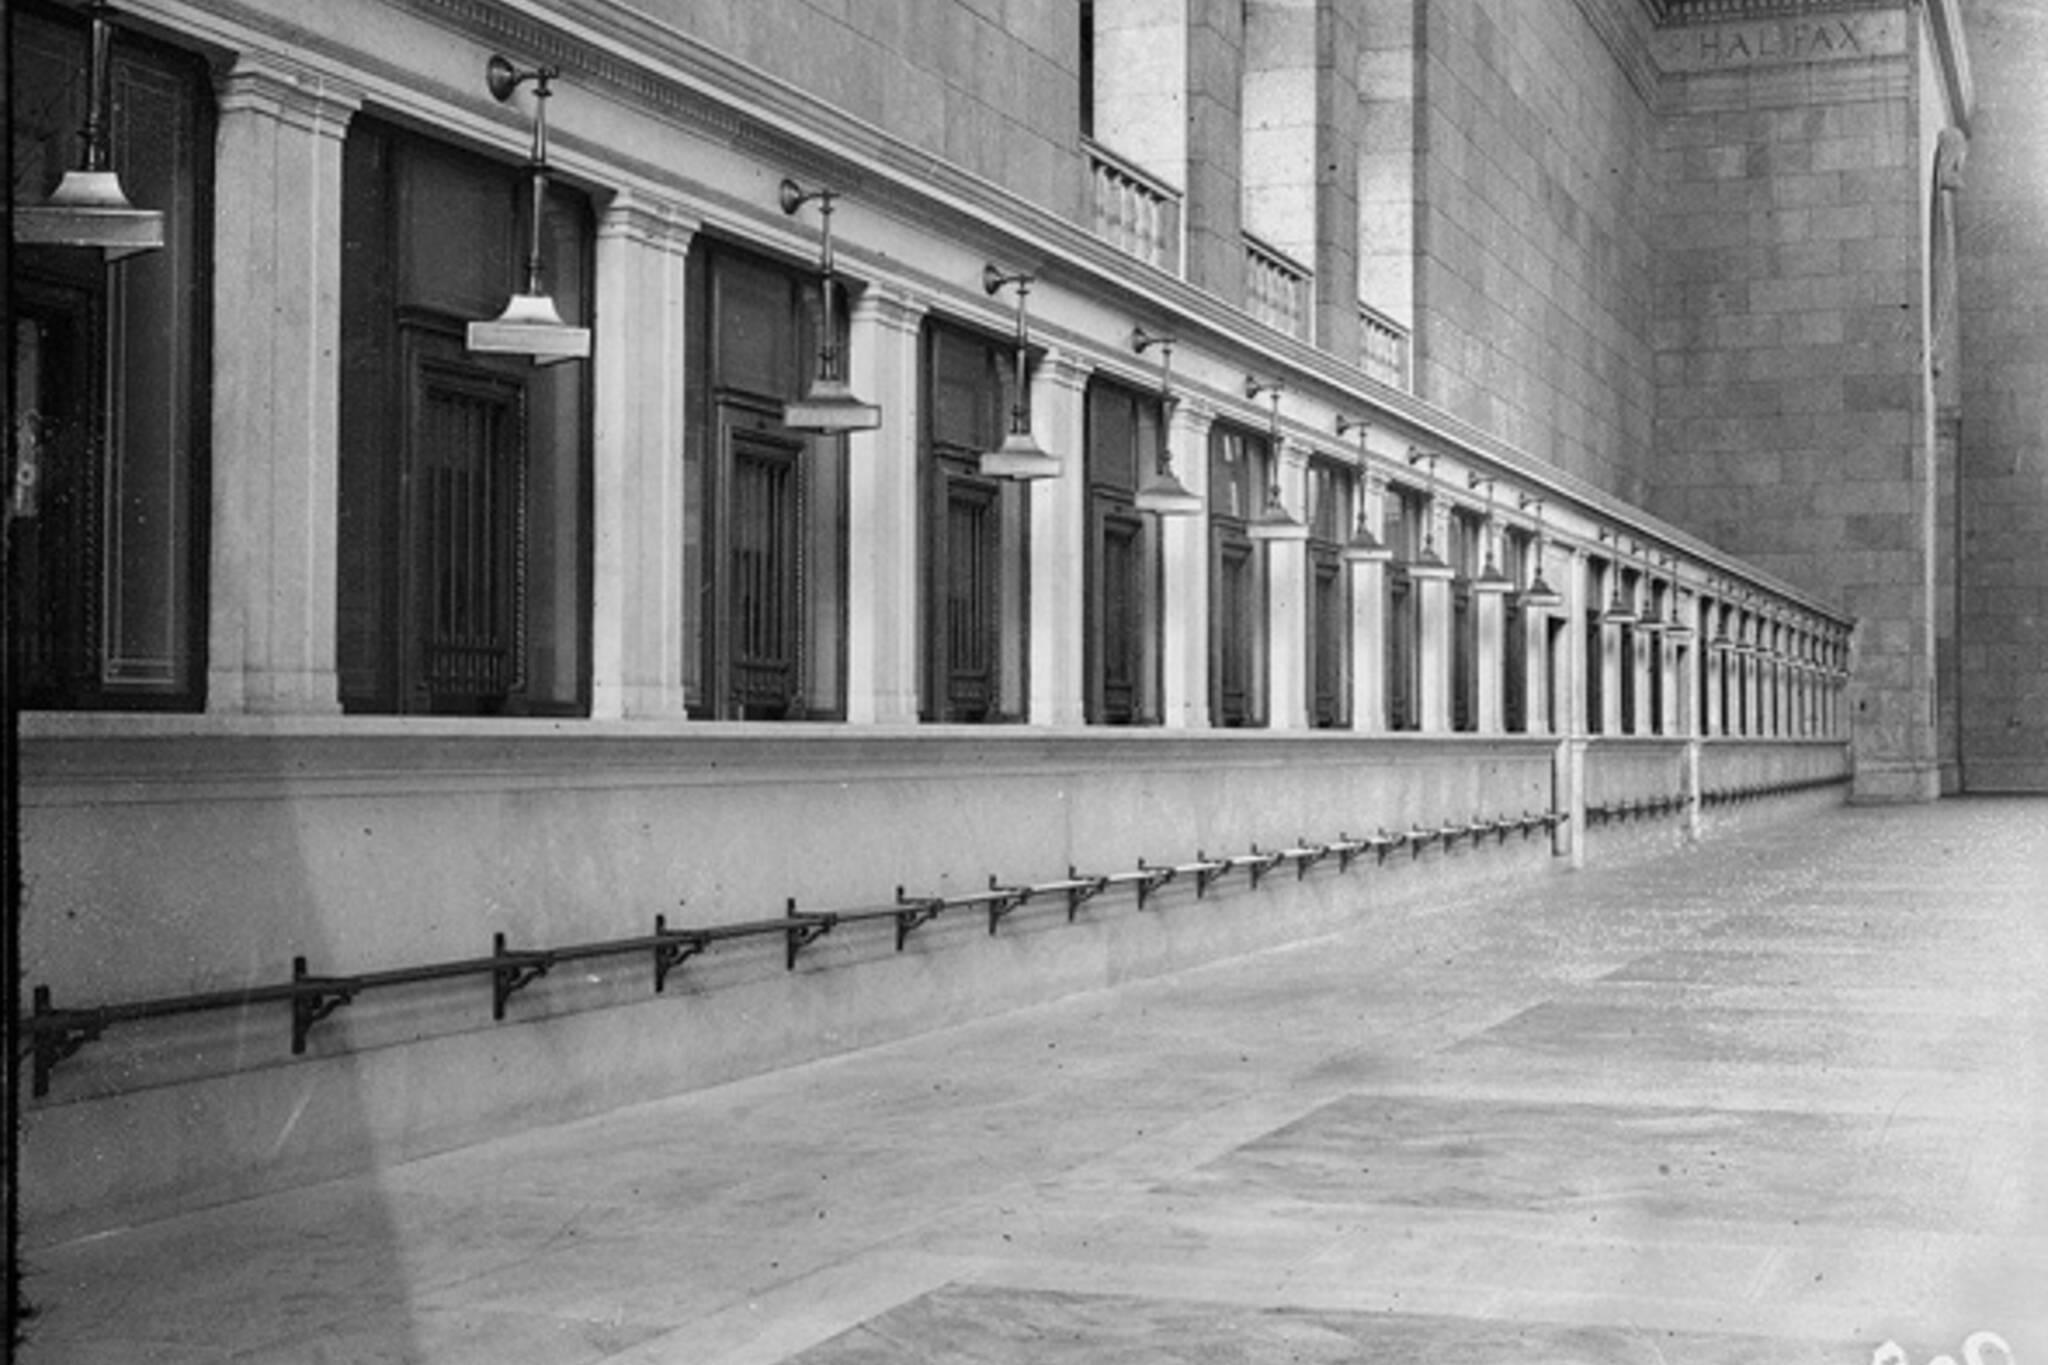 Union Station Toronto Historical